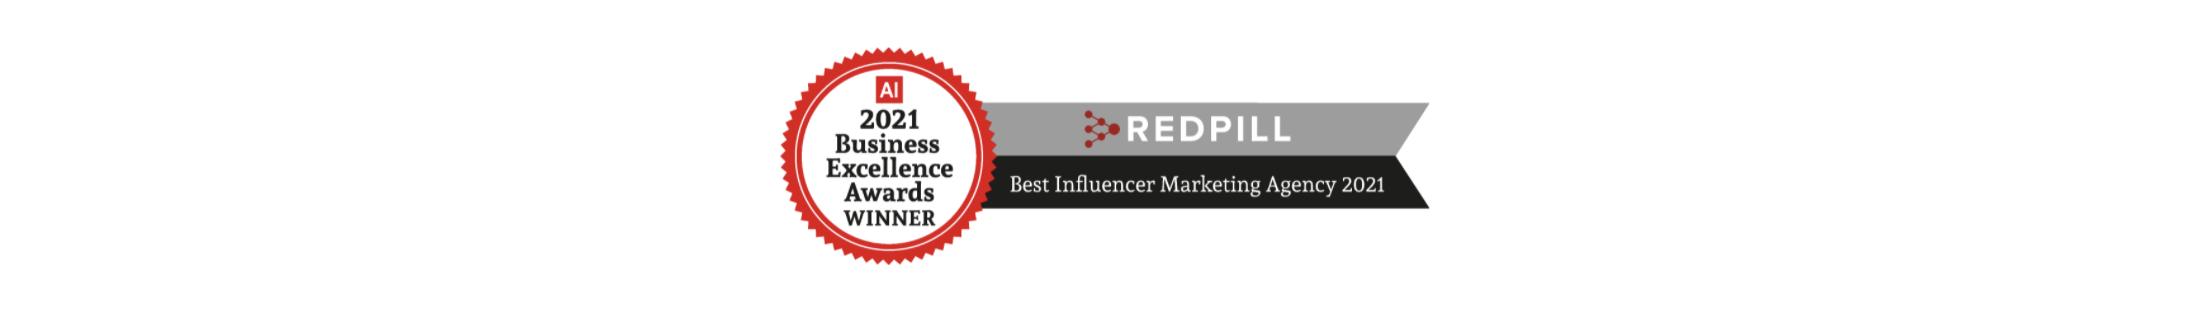 REDPILL-Best-Influencer-Marketing-Agency-2021